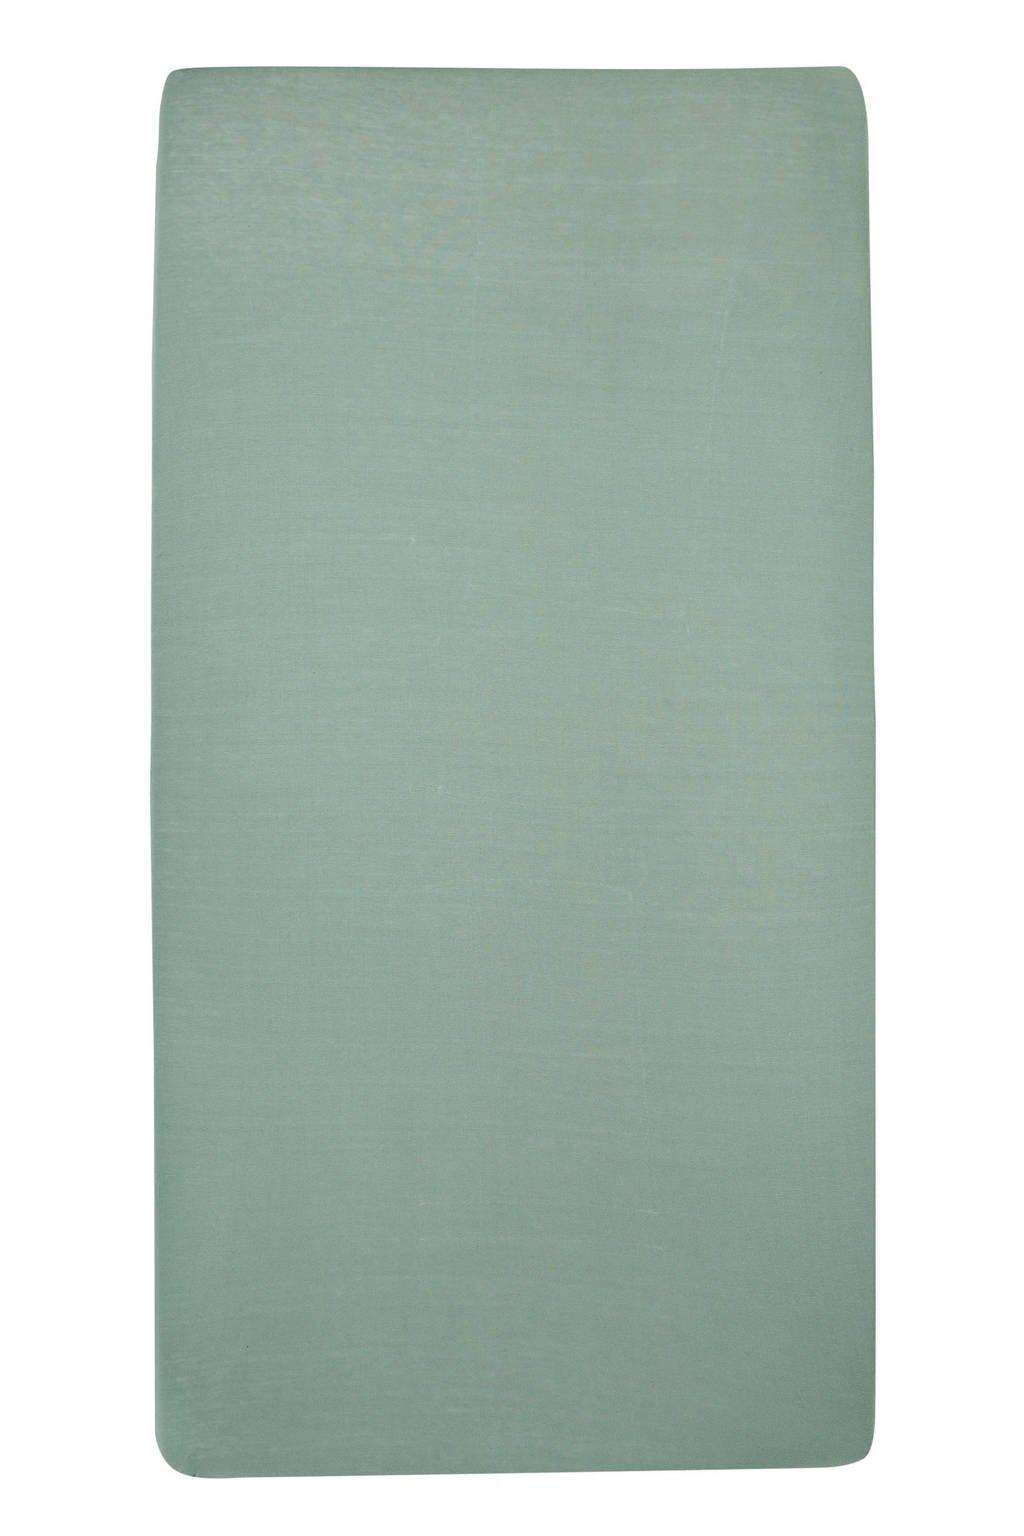 Meyco katoenen hoeslaken ledikant 60x120 cm (set van 2) Stone green, Stone Green